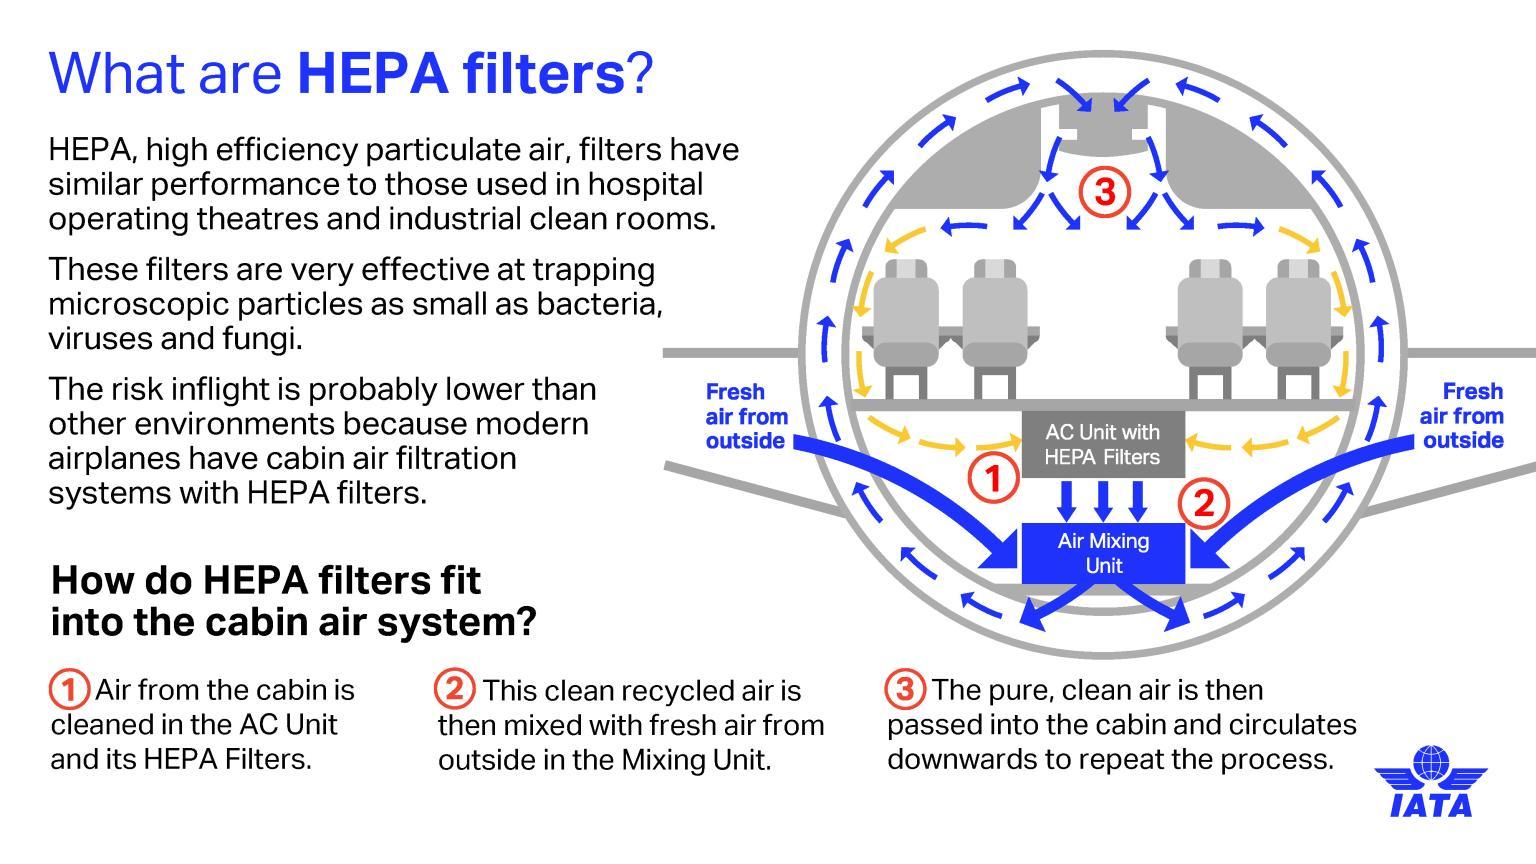 Aircraft HEPA filters - source IATA